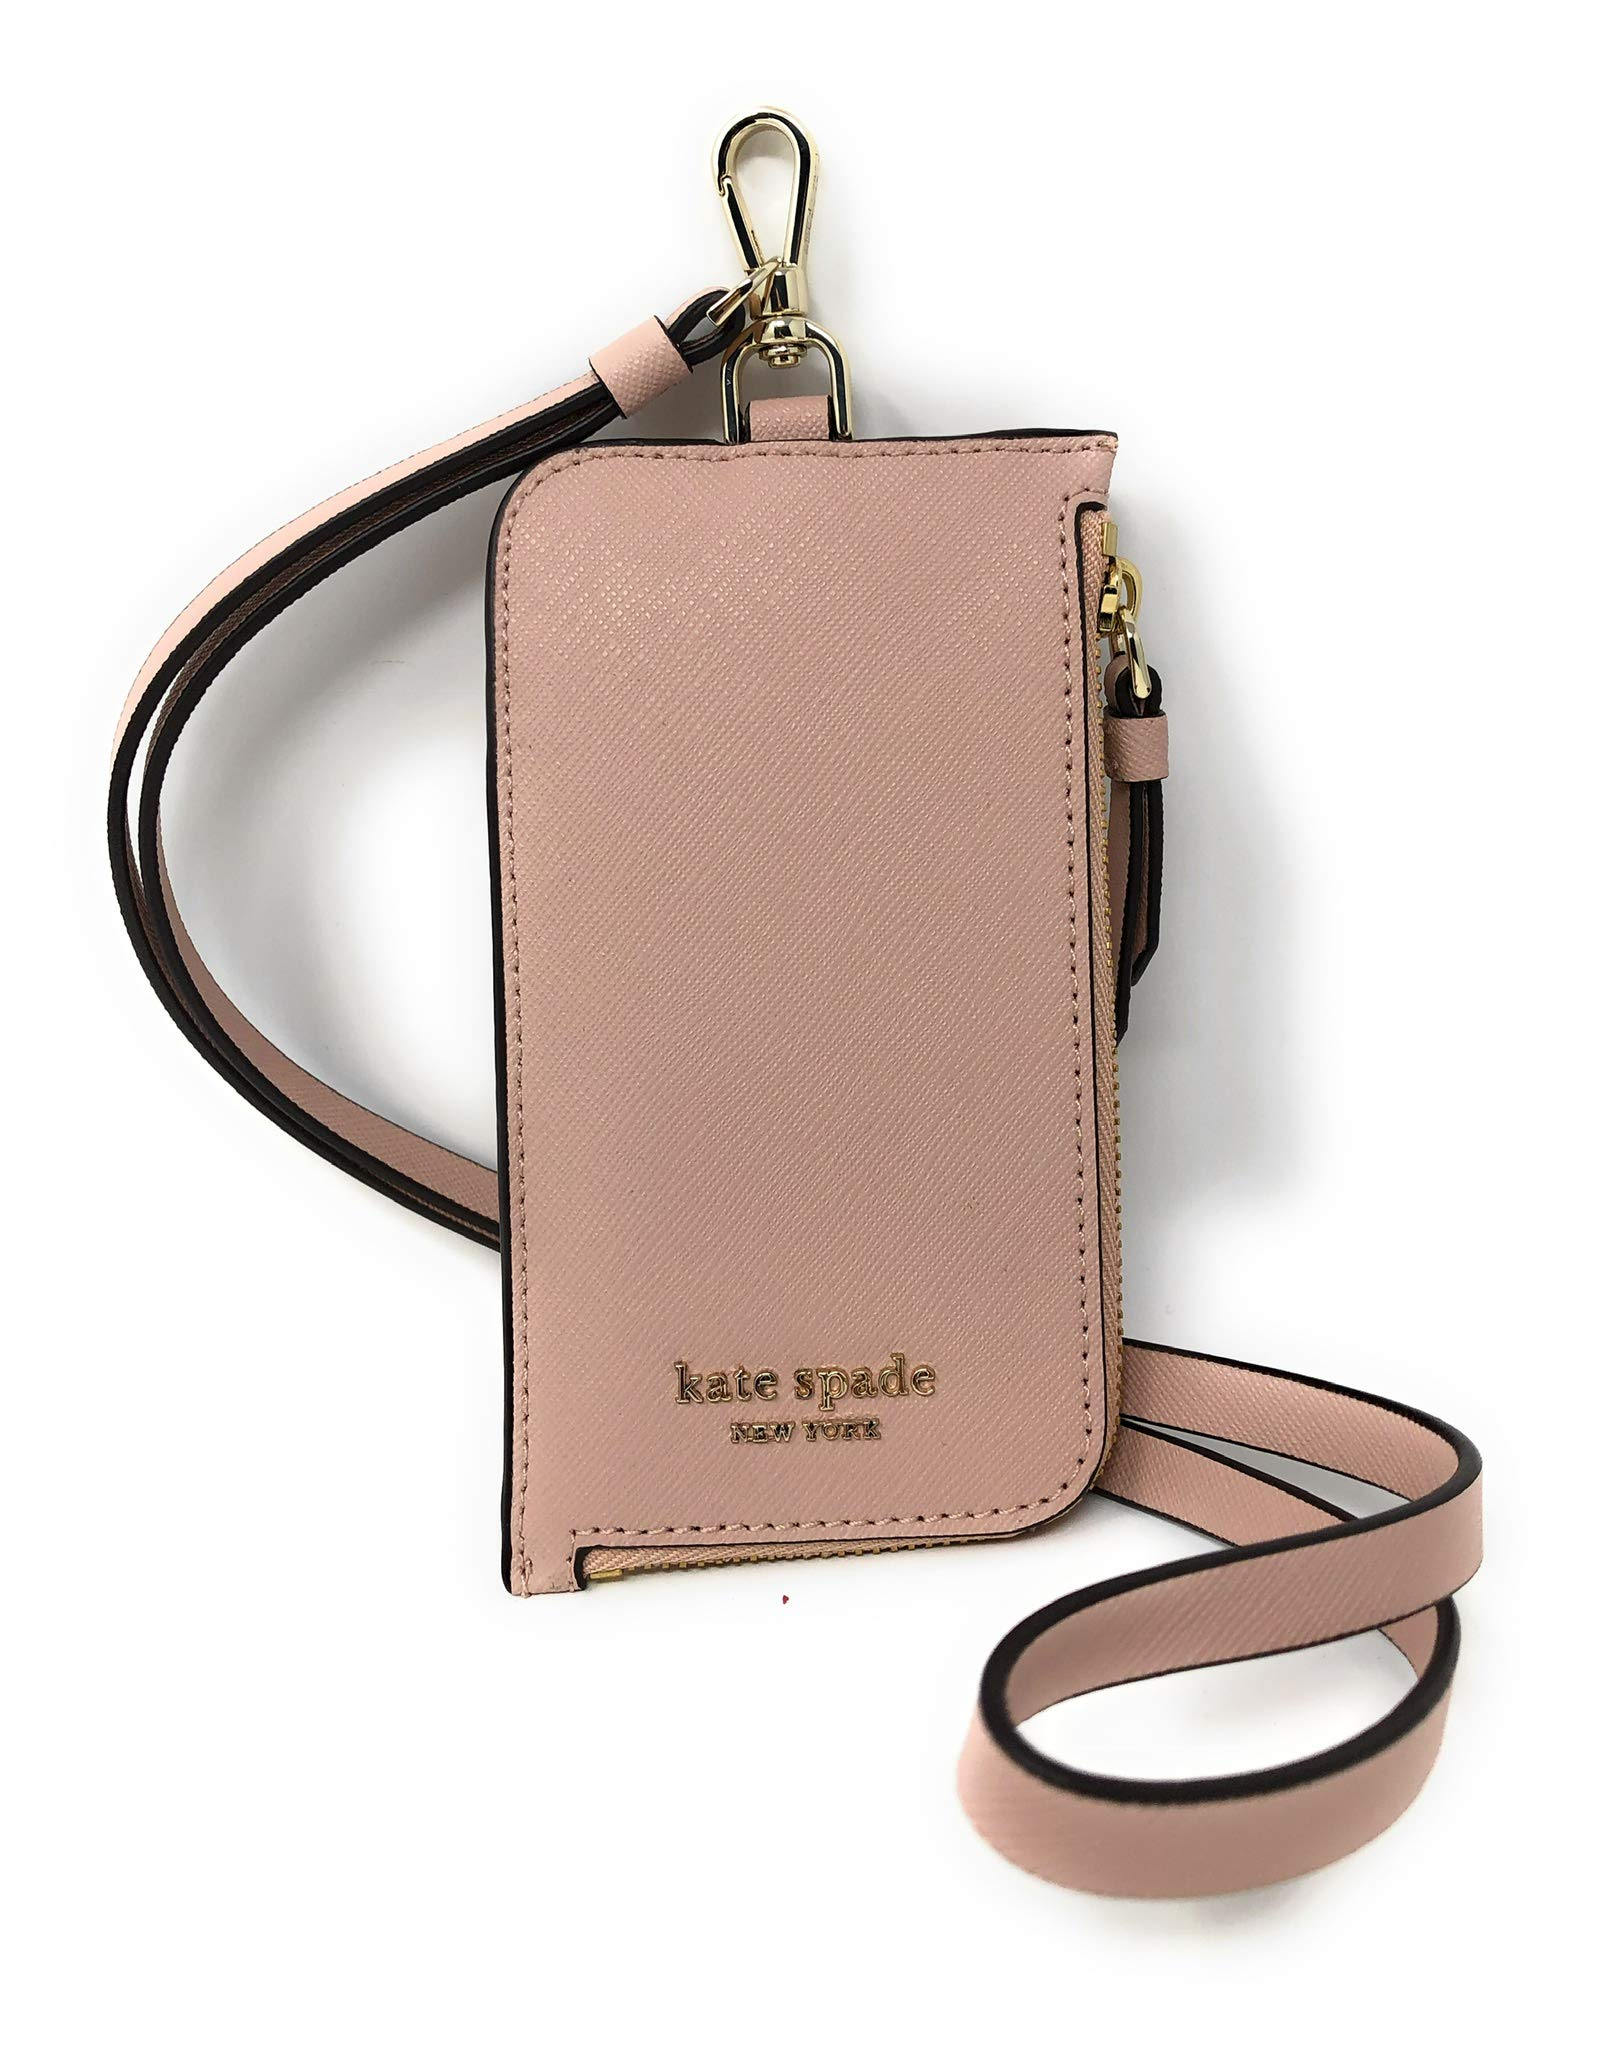 Kate Spade New York L-Zip Saffiano Leather Card Case Lanyard Warm Vellum